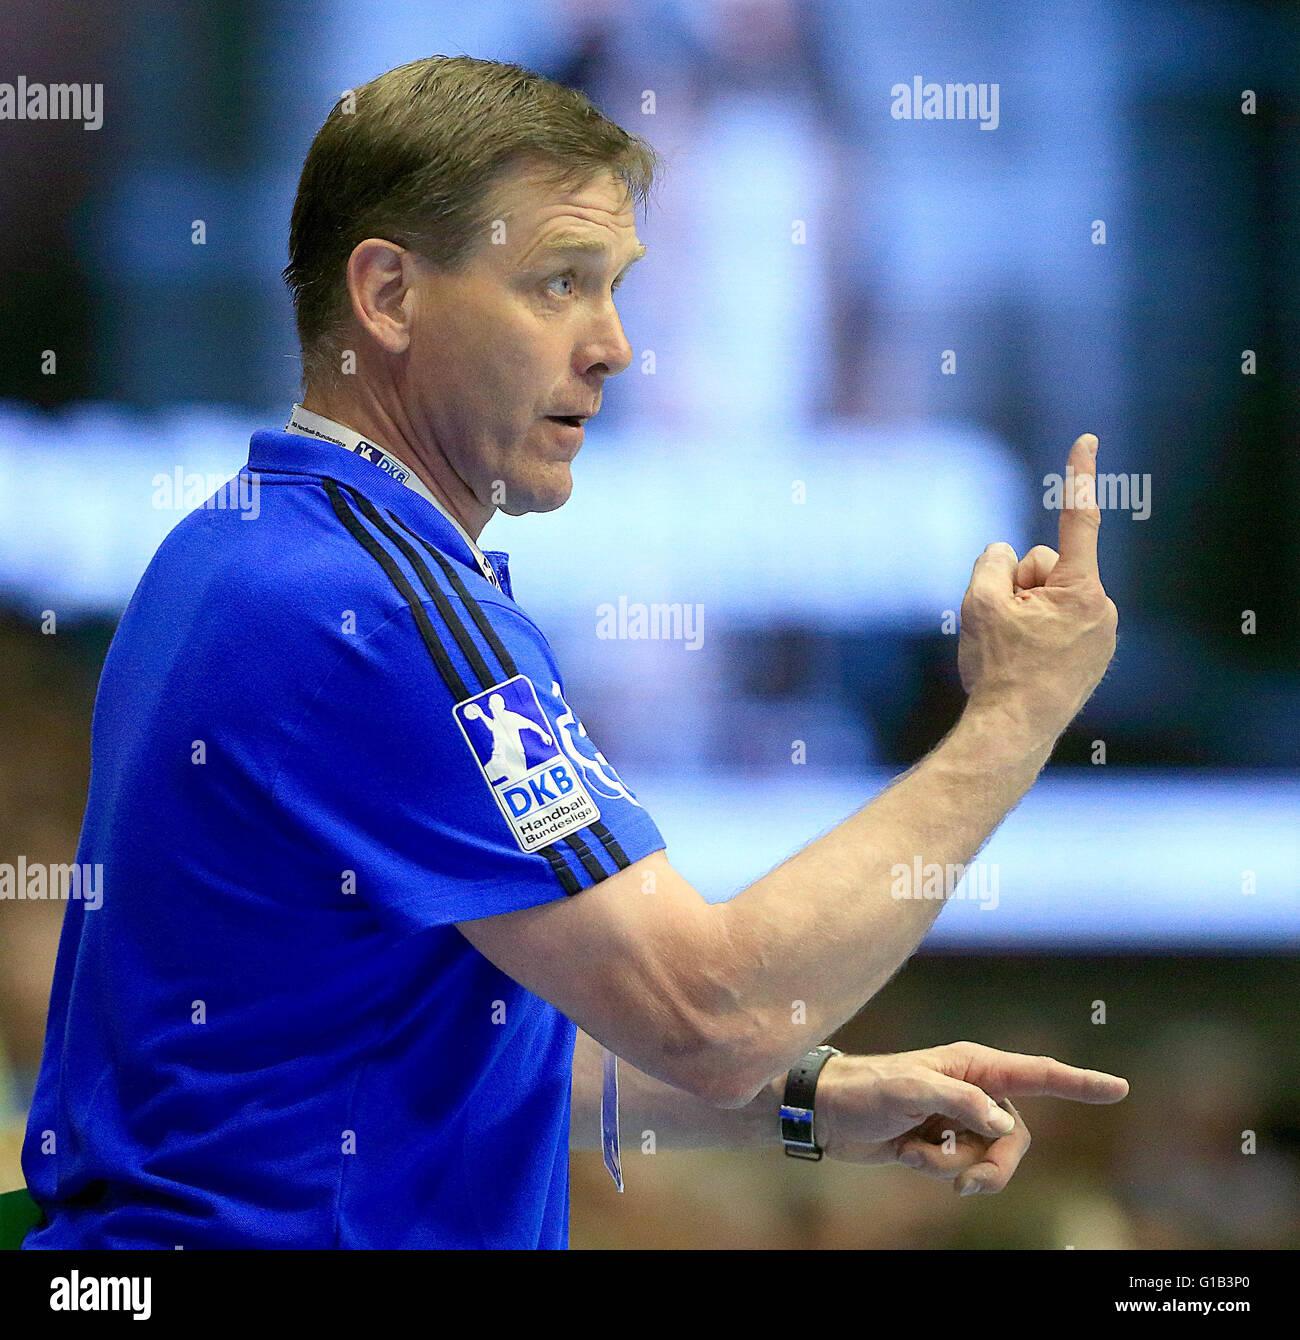 Kiel's coach Alfred Gislason reacts during the Bundesliga handball match SC Magdeburg vs THW Kiel in Magdeburg, - Stock Image